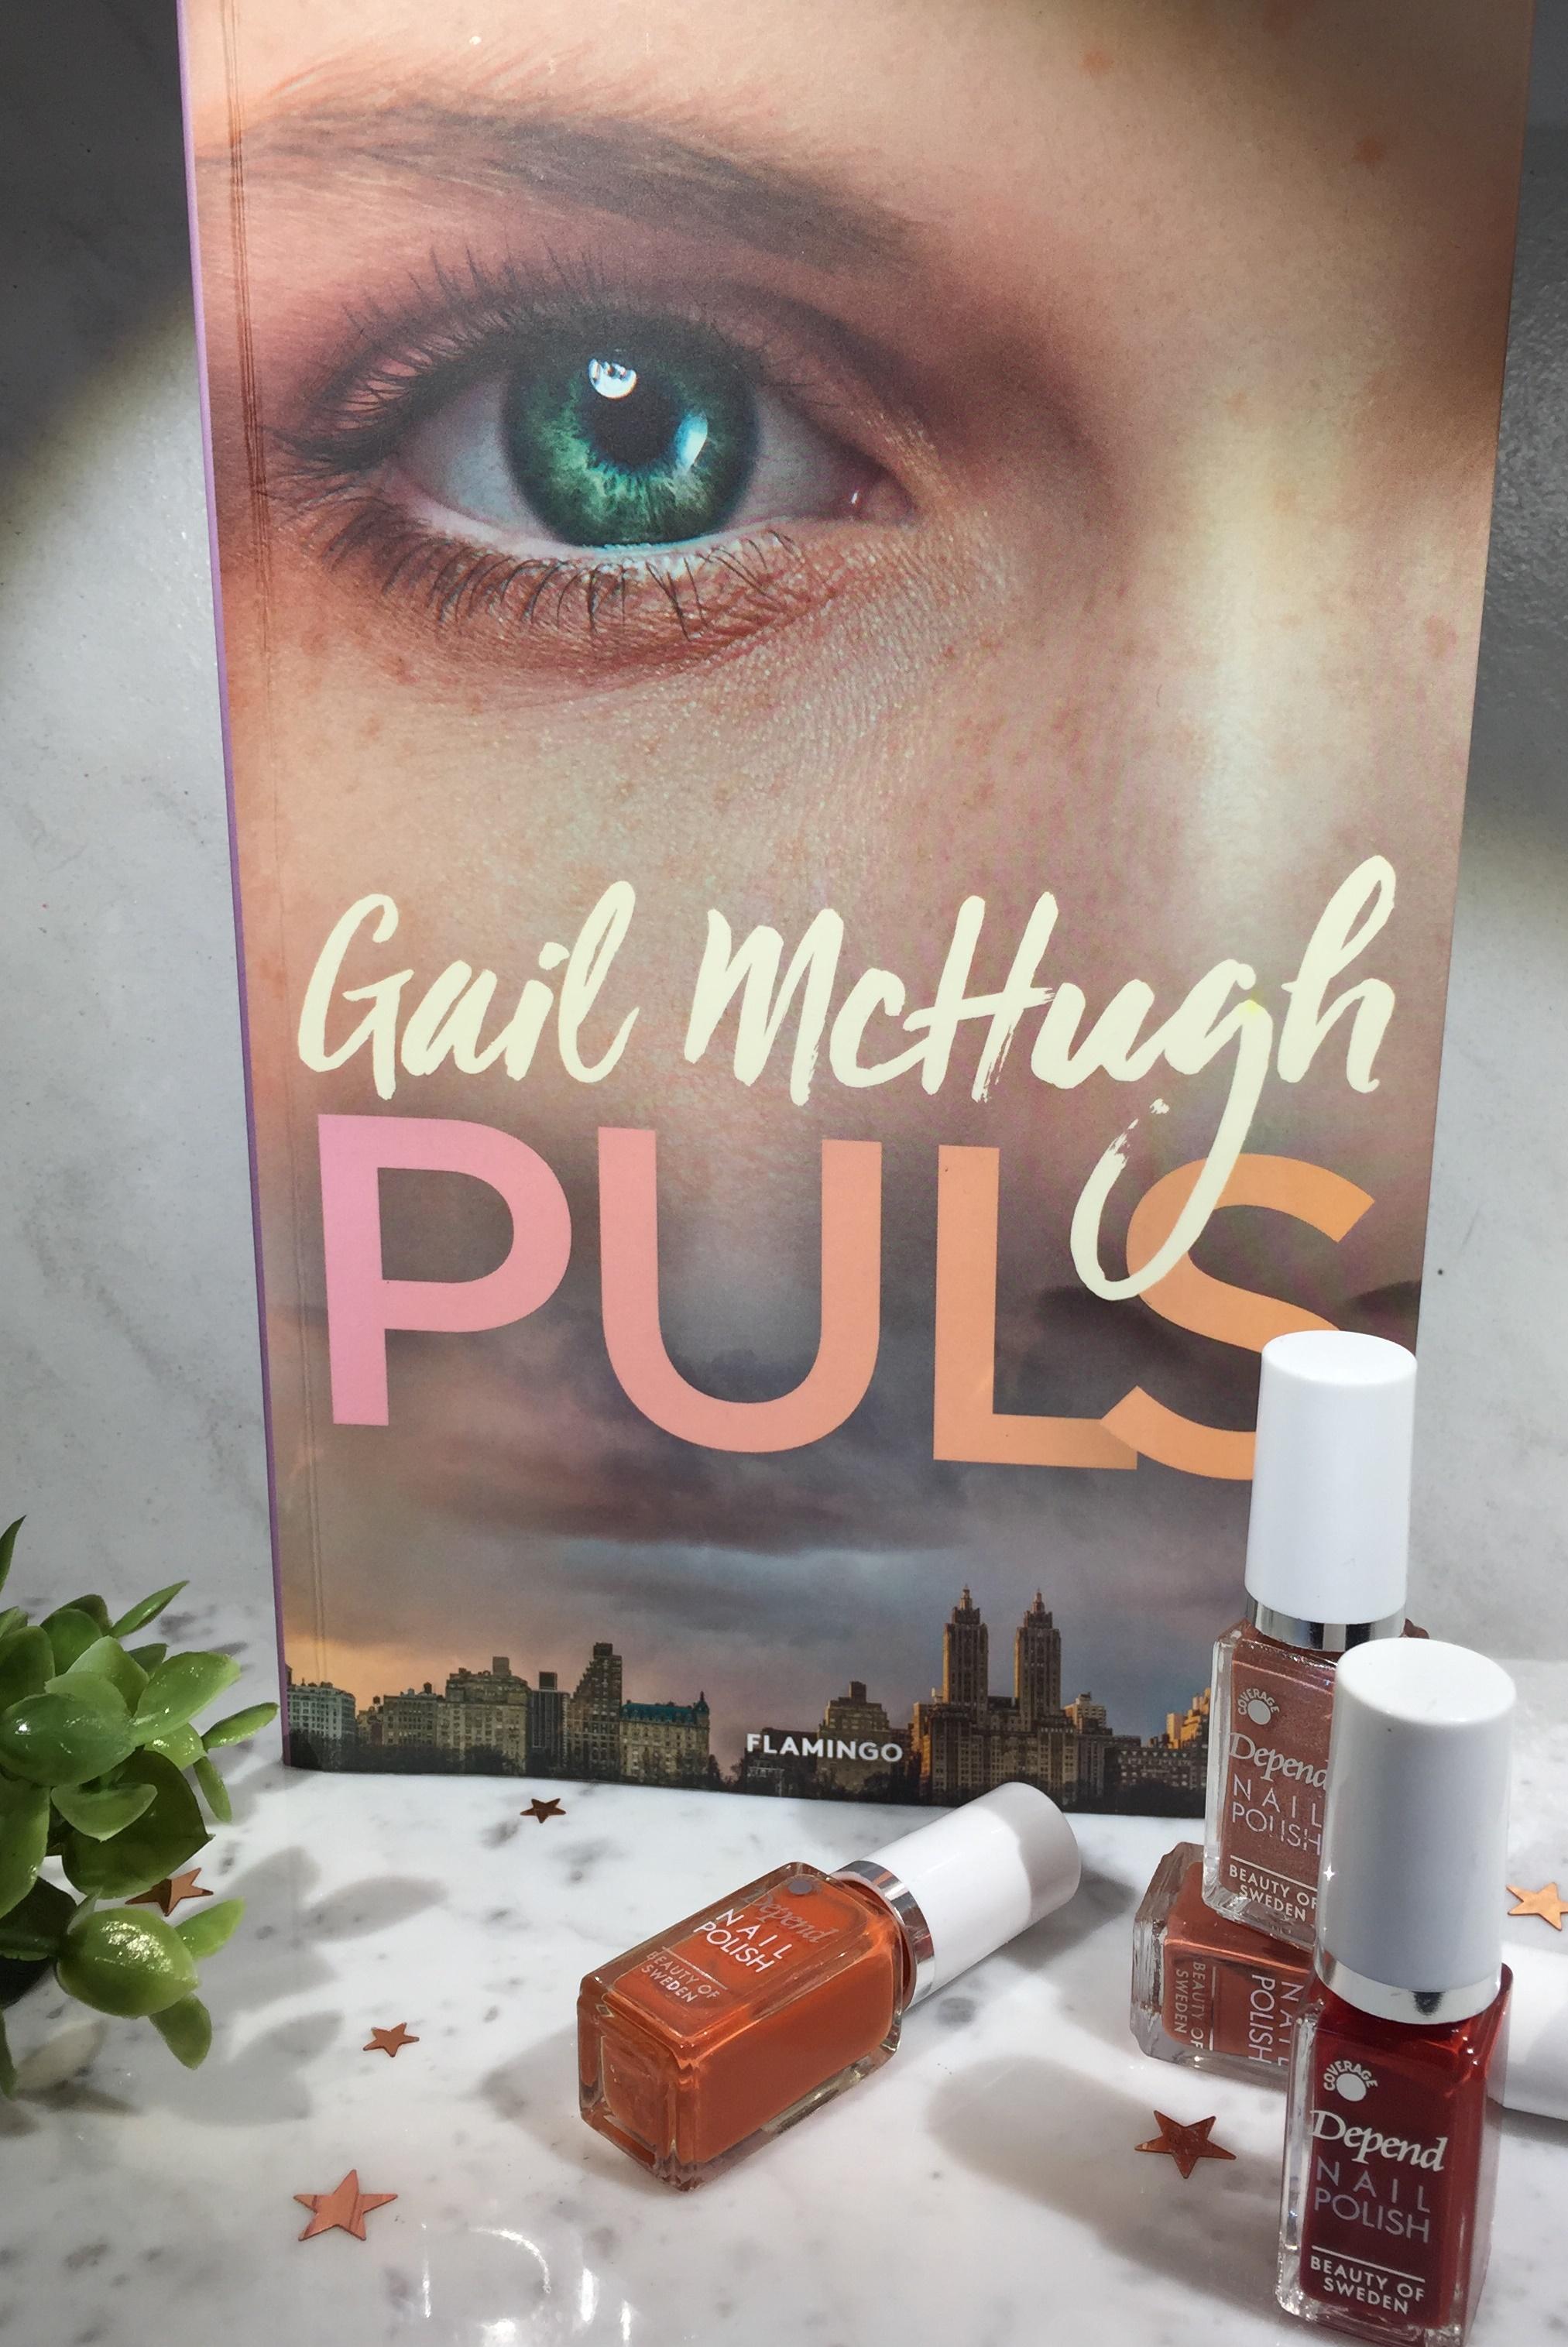 Boganmeldelse, Flamingo Books, Boganmeldelse Puls, Anmeldelse Gail McHugh Puls, Krummes Krummelurer